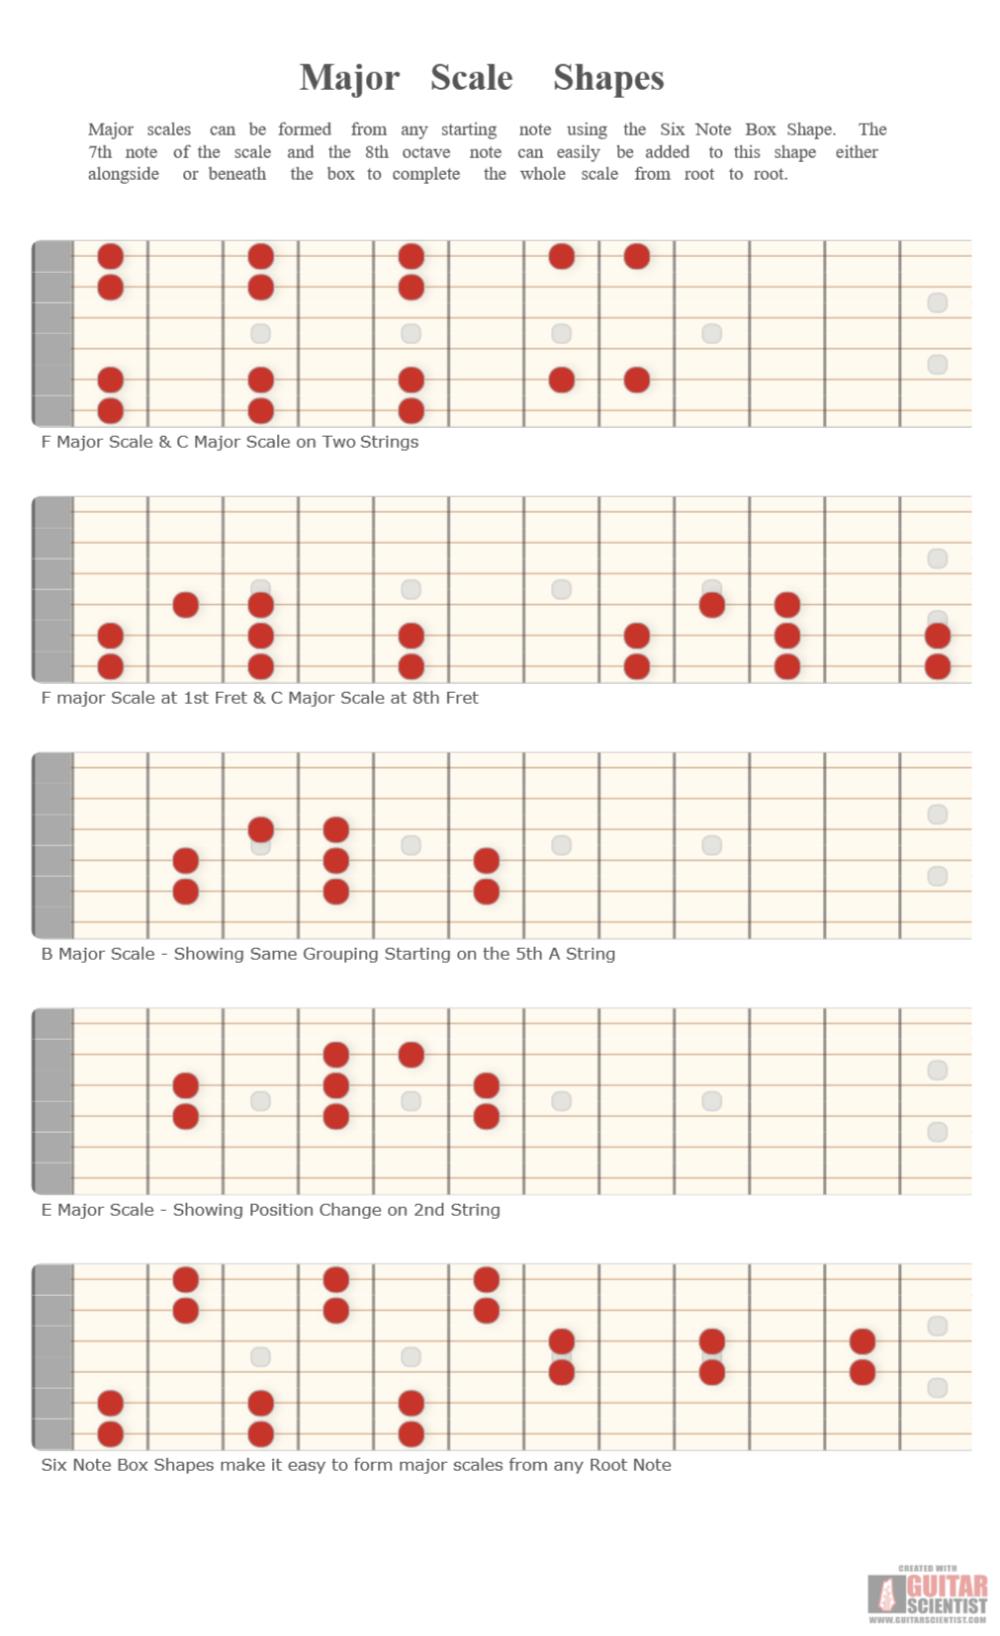 Major Scale Shapes Guitar Scientist Major Scale Guitar Chords And Scales Guitar Scales Charts